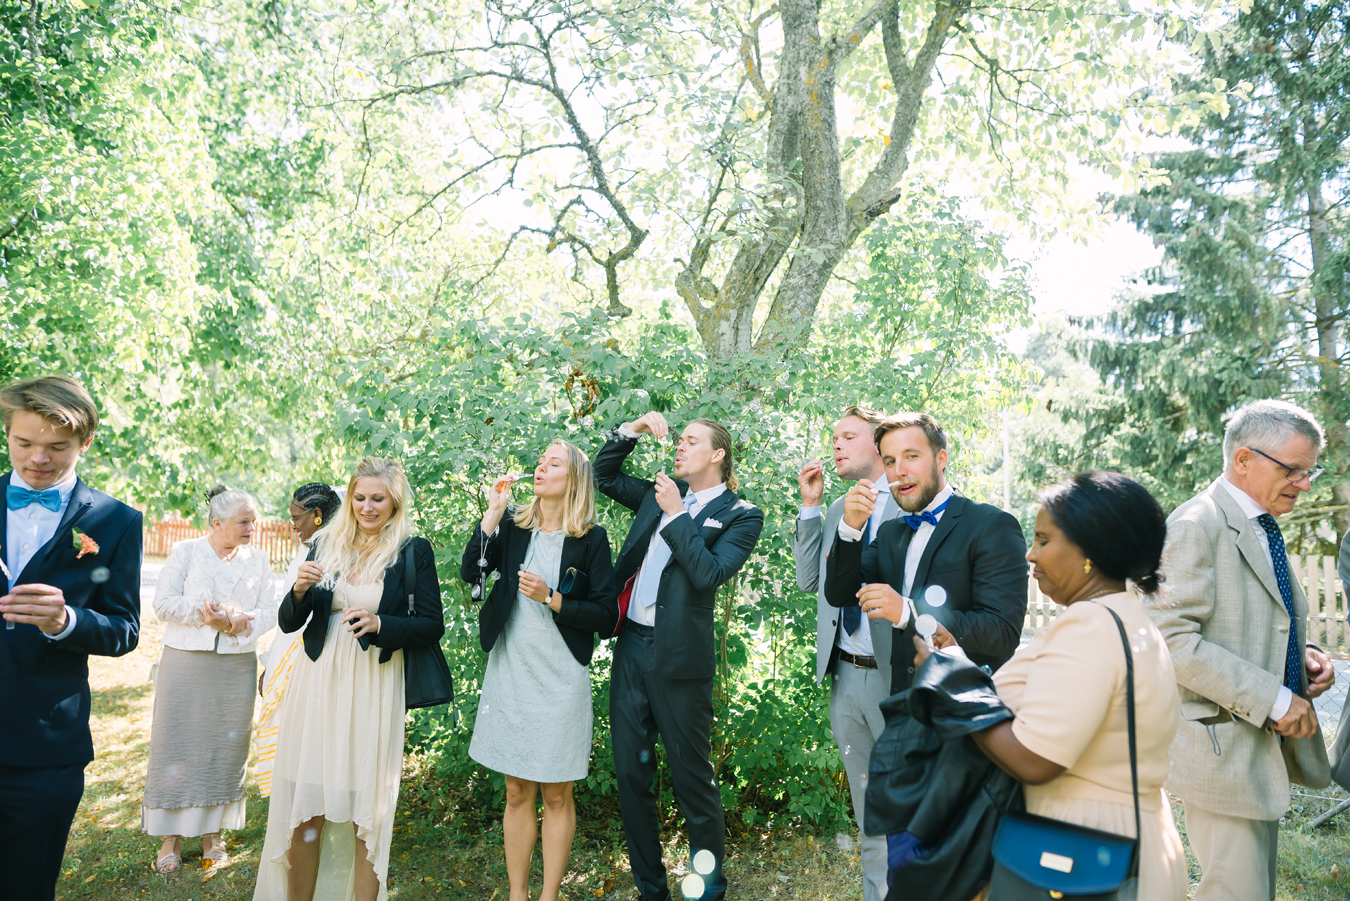 031-bröllop-gotland-fridhem-neas-fotografi.jpg